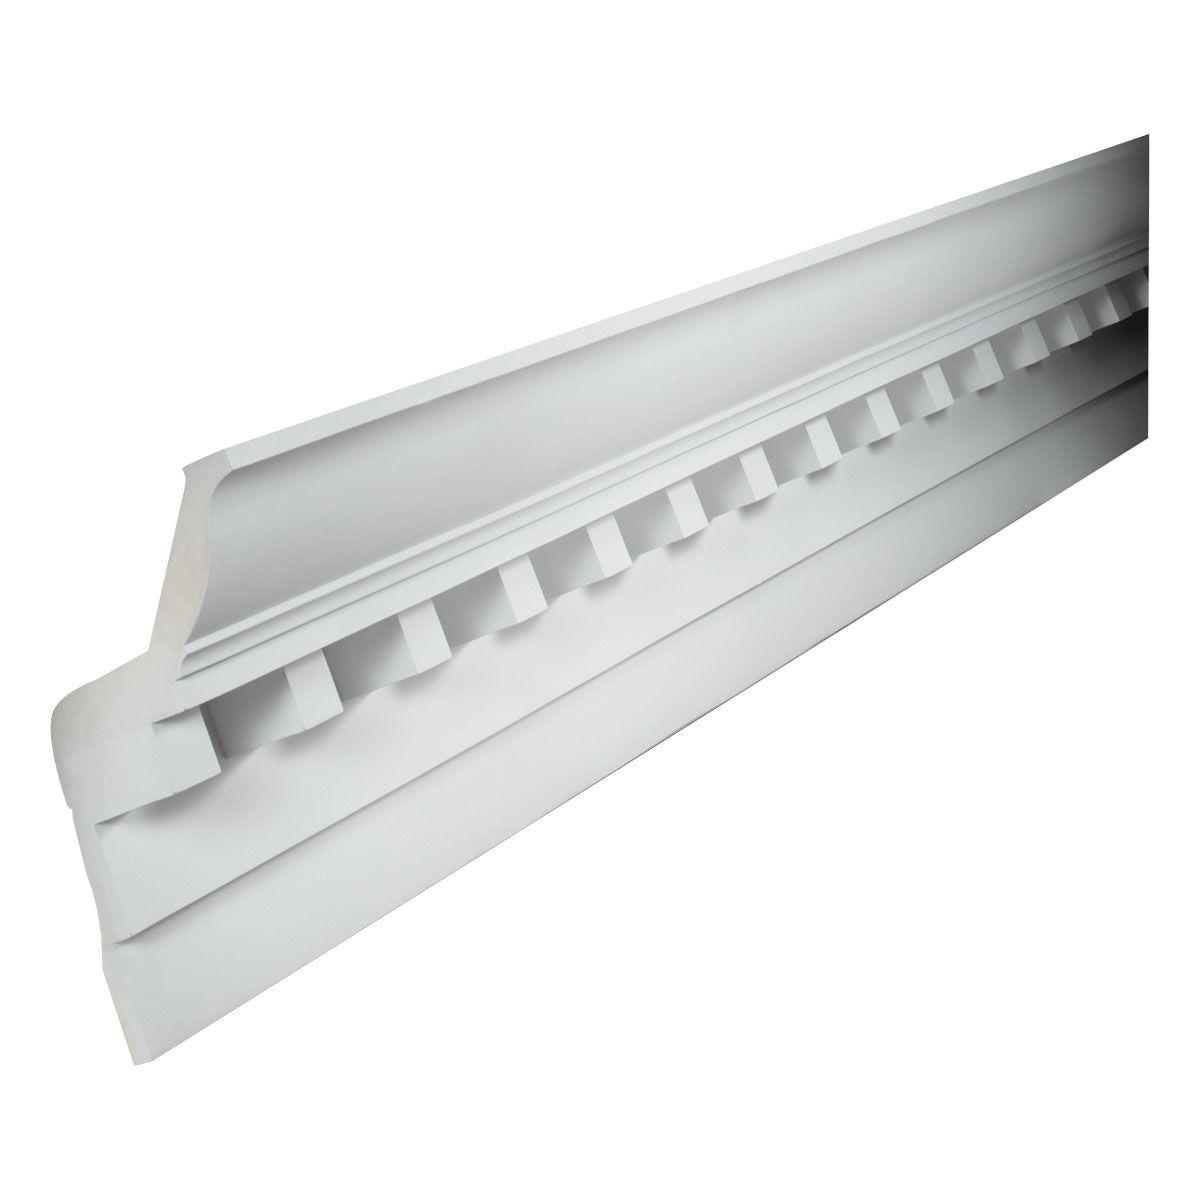 14 1 2 h x 2 t 4 s x 10 p 12 39 length dentil cornice for Buy fypon